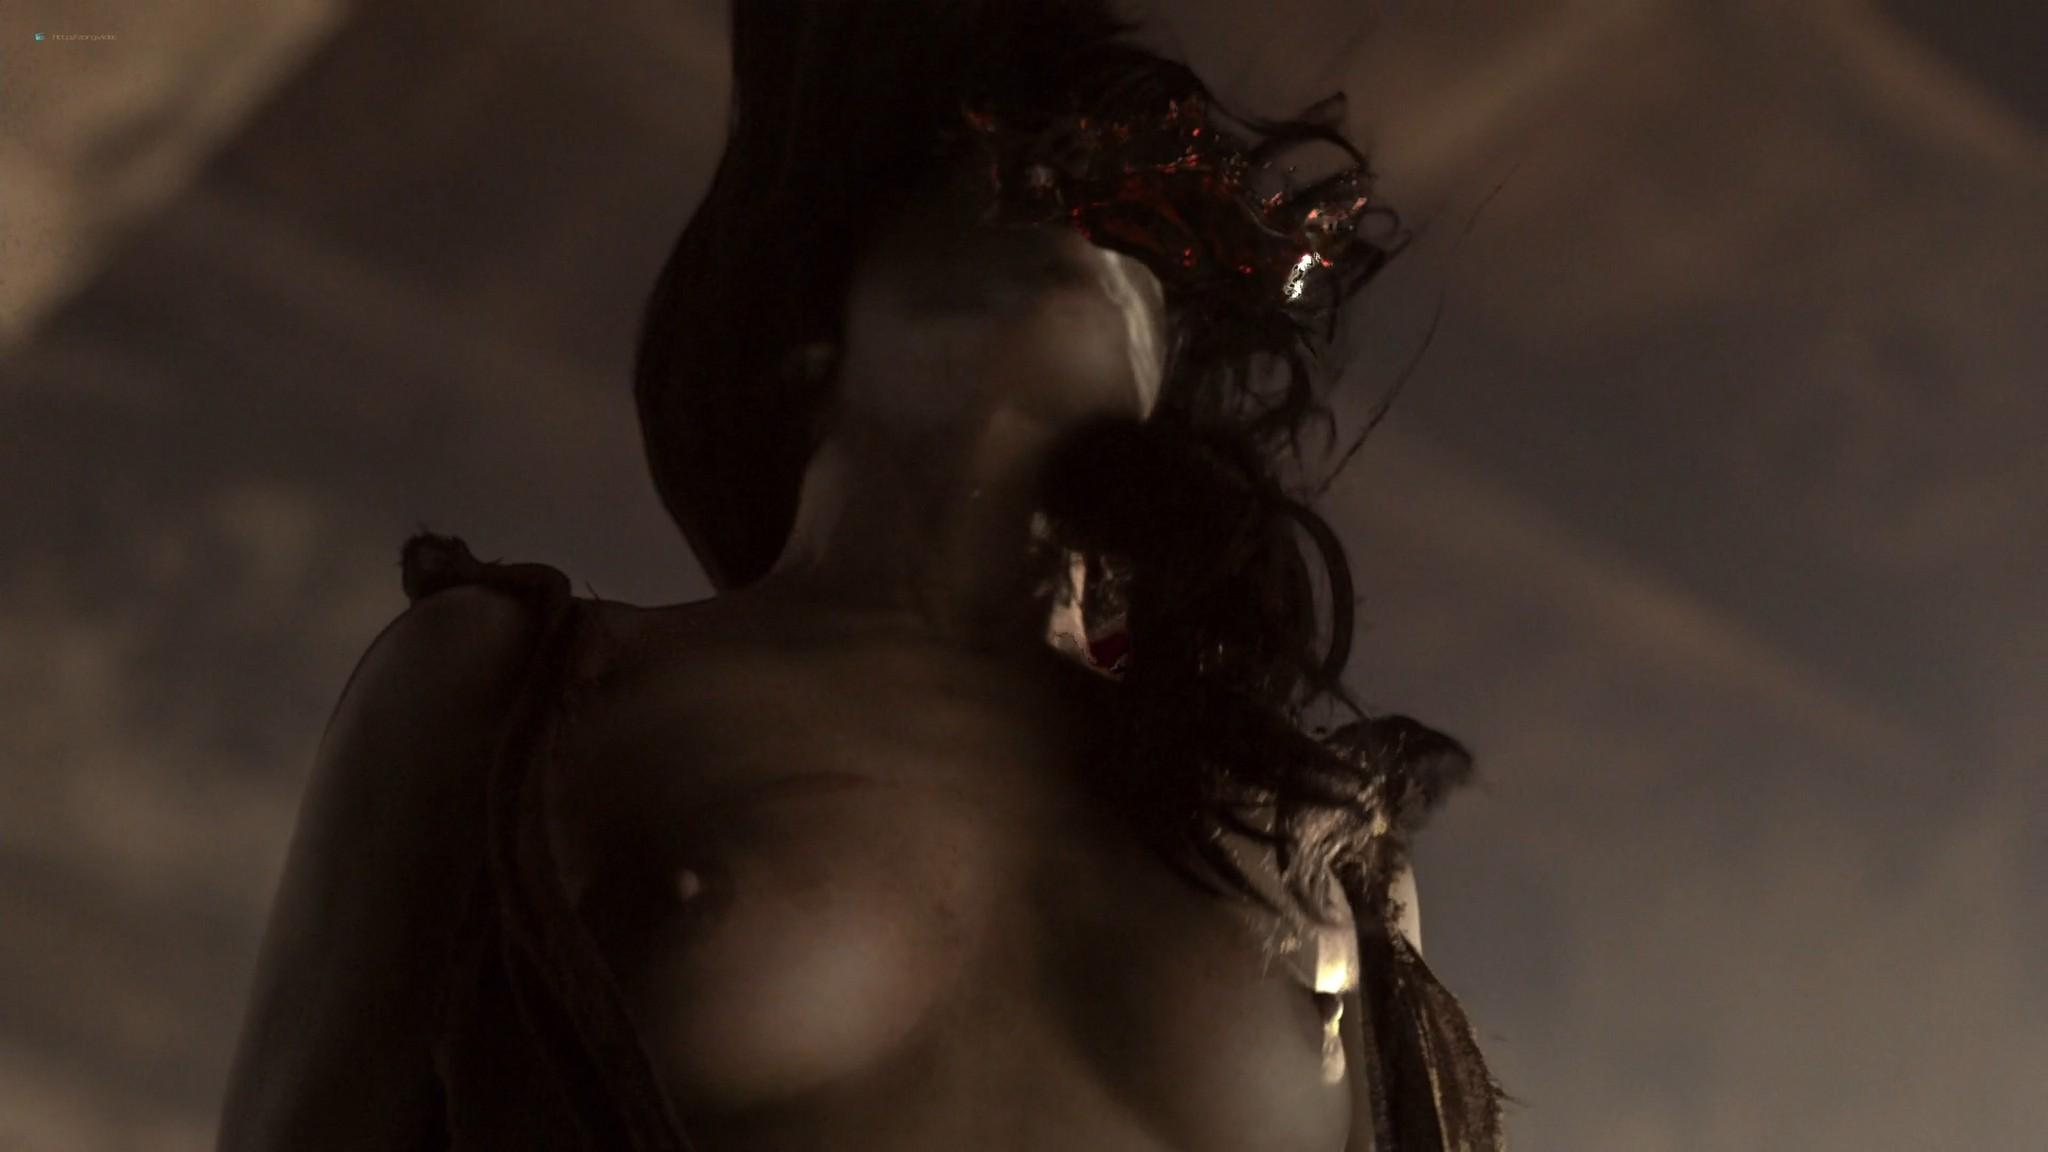 Lucy Lawless nude sex Erin Cummings, Aria Dickson nude too - Spartacus - Sacramentum Gladiatorum (2010) s1e2 HD 1080p (11)